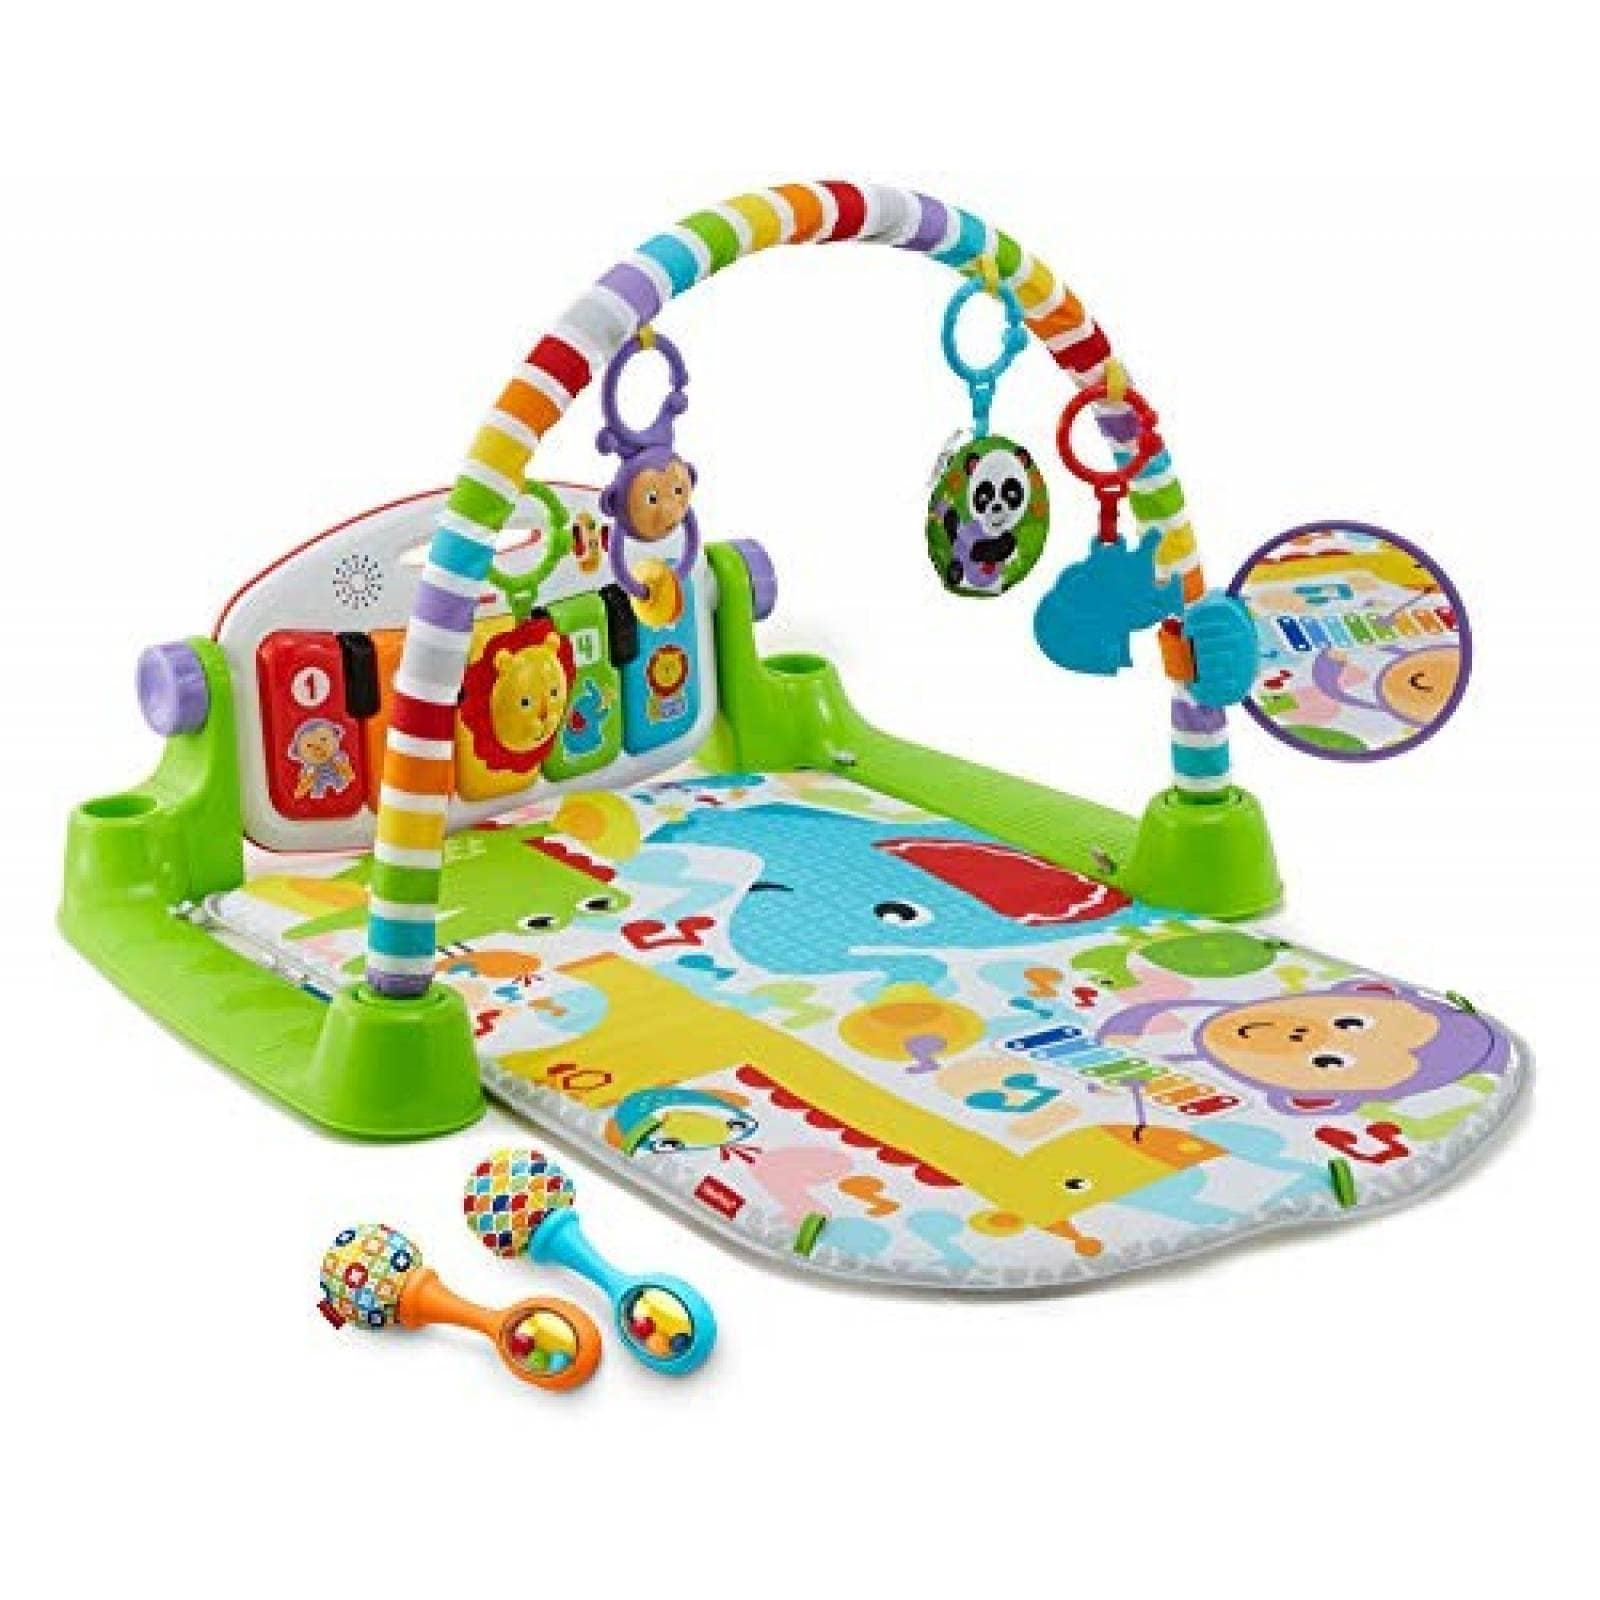 Juguetes Para Bebes De 20 Meses.Juguete De Piano Fisher Price Para Bebes Verde